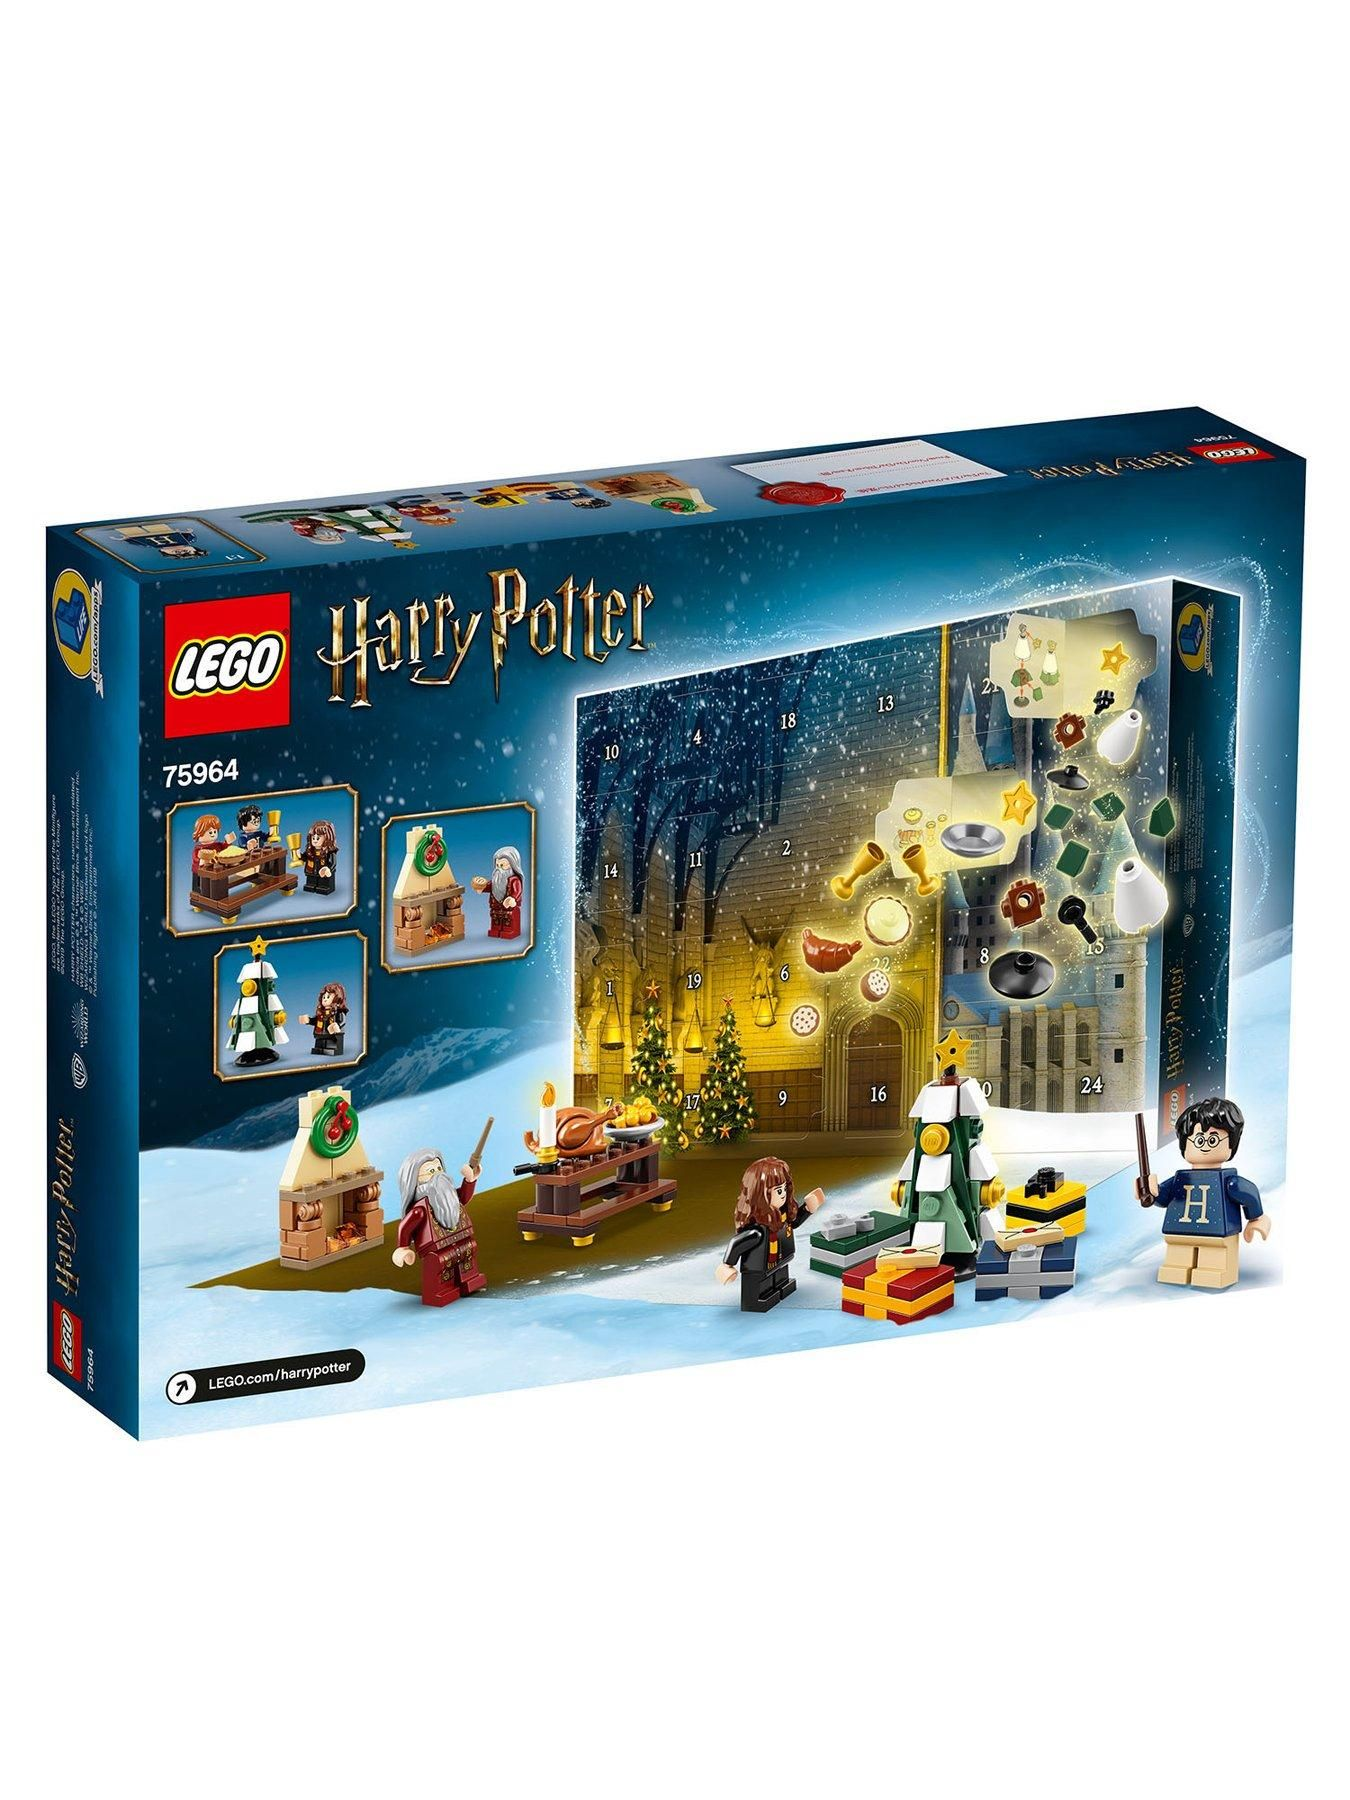 Lego Harry Potter 75964 Advent Calendar 2019 With Minifigures